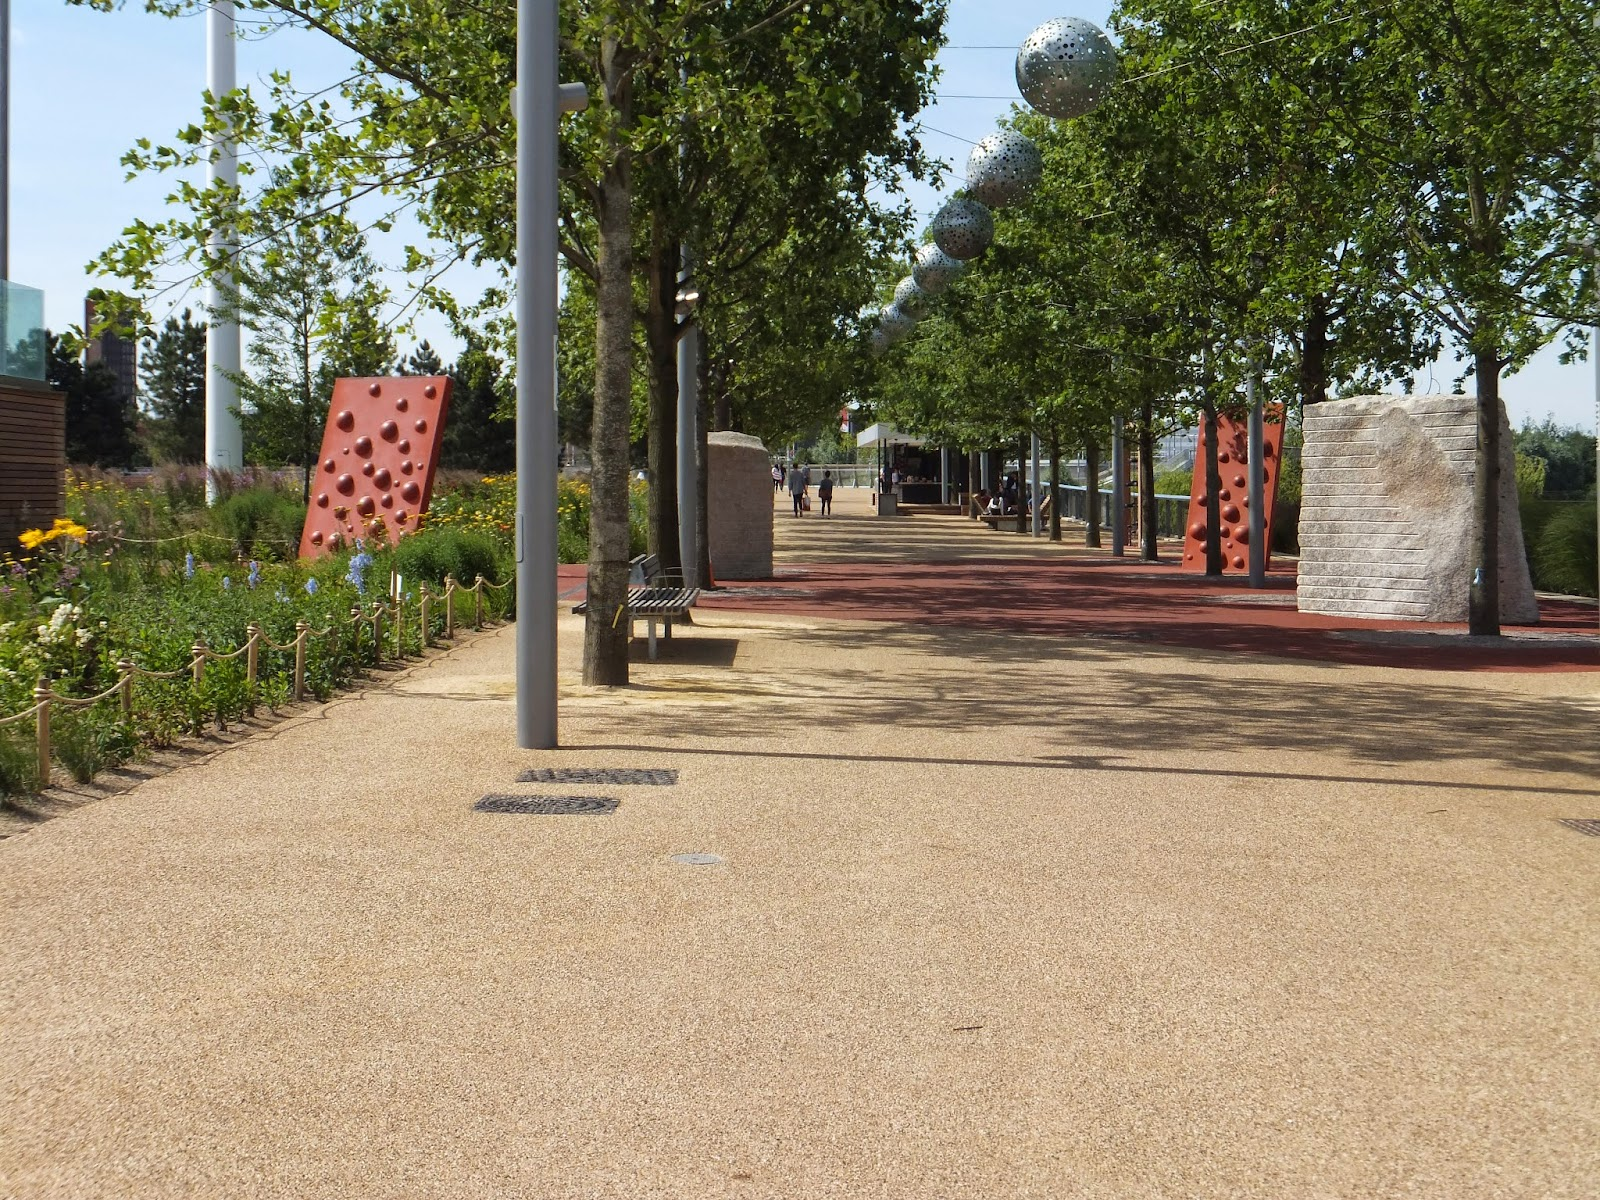 Queen Elizabeth Olympic Park, London